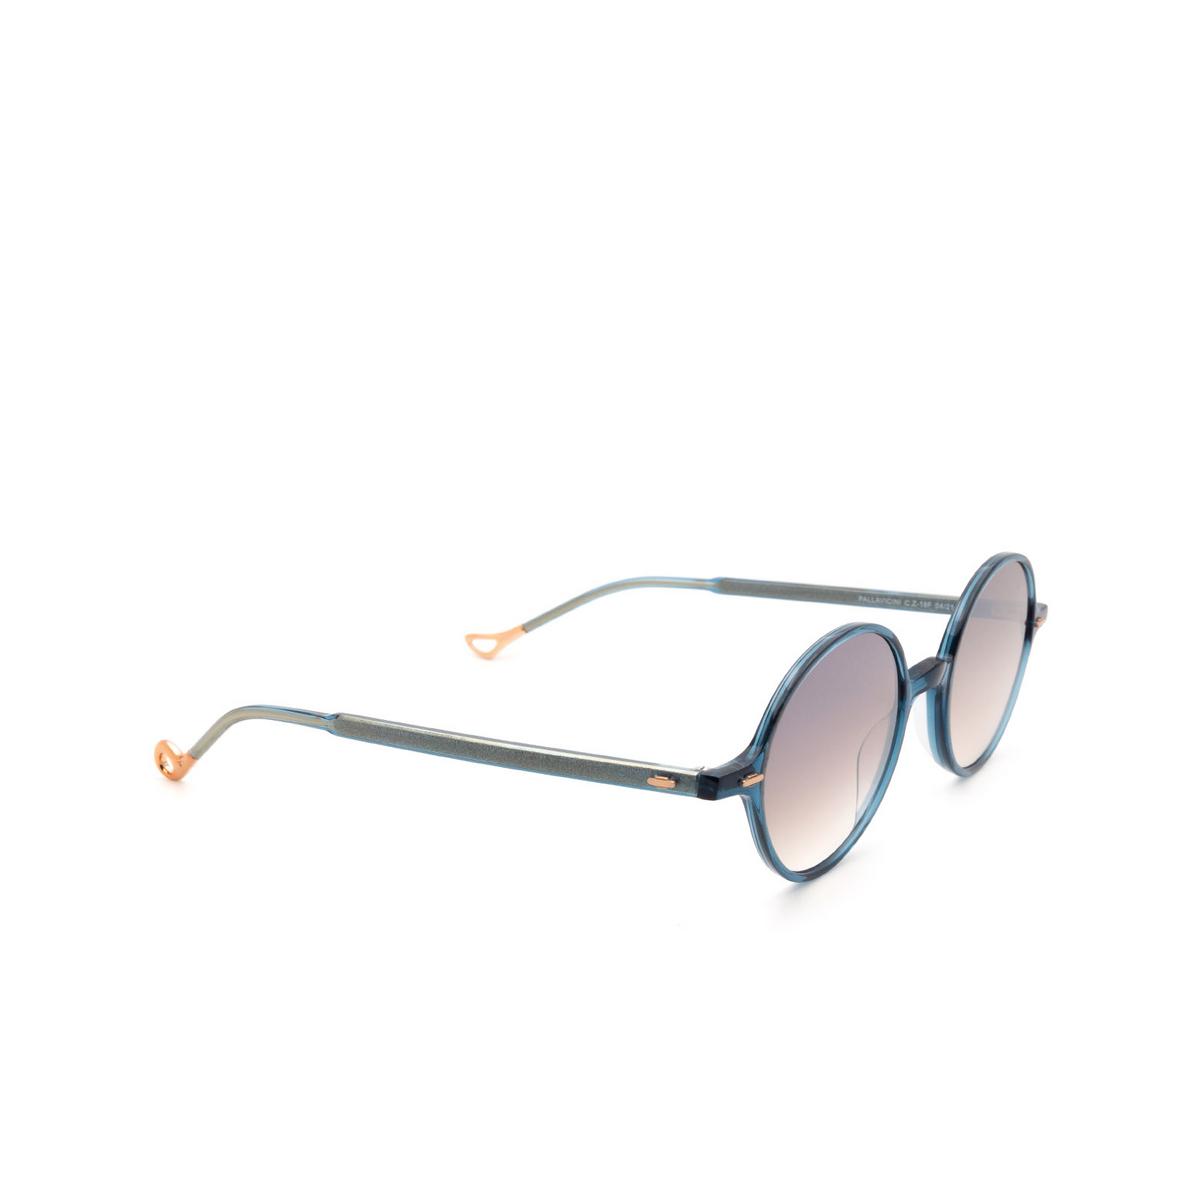 Eyepetizer® Round Sunglasses: Pallavicini color Blue C.Z-18F - three-quarters view.